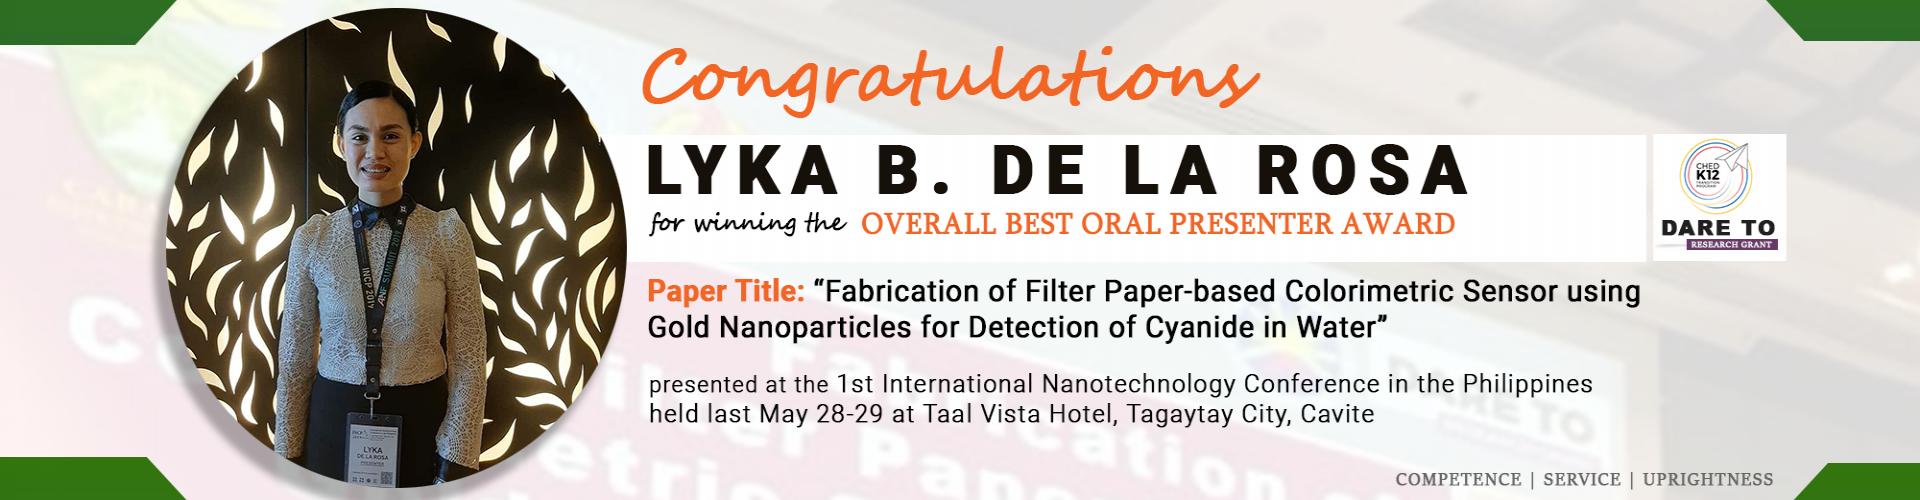 Lyka B. Dela Rosa - Overall best oral presenter awardee